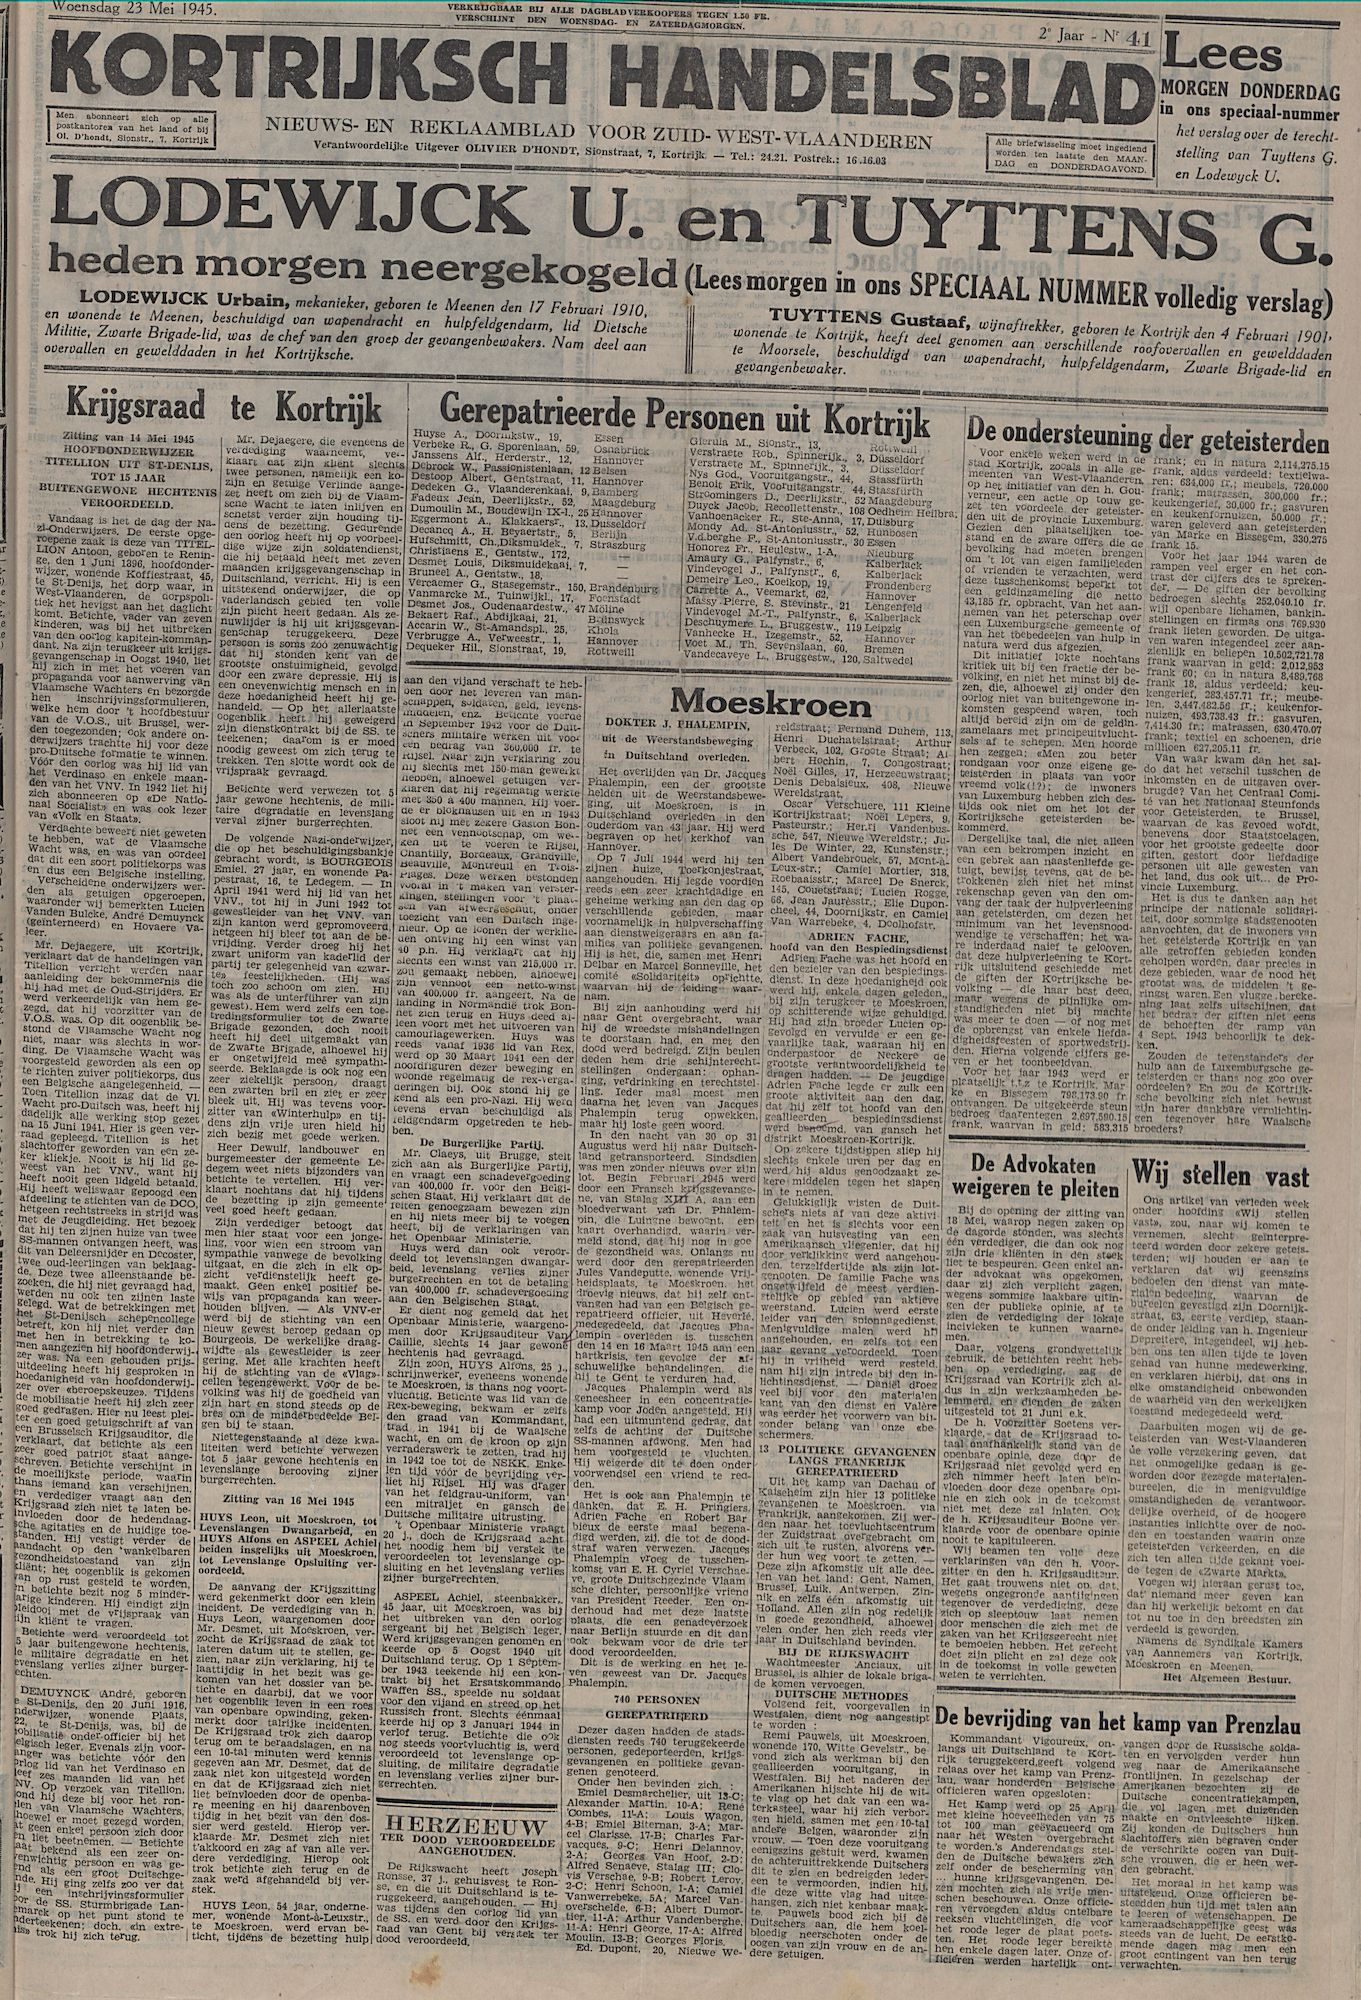 Kortrijksch Handelsblad 23 mei 1945 Nr41 p1